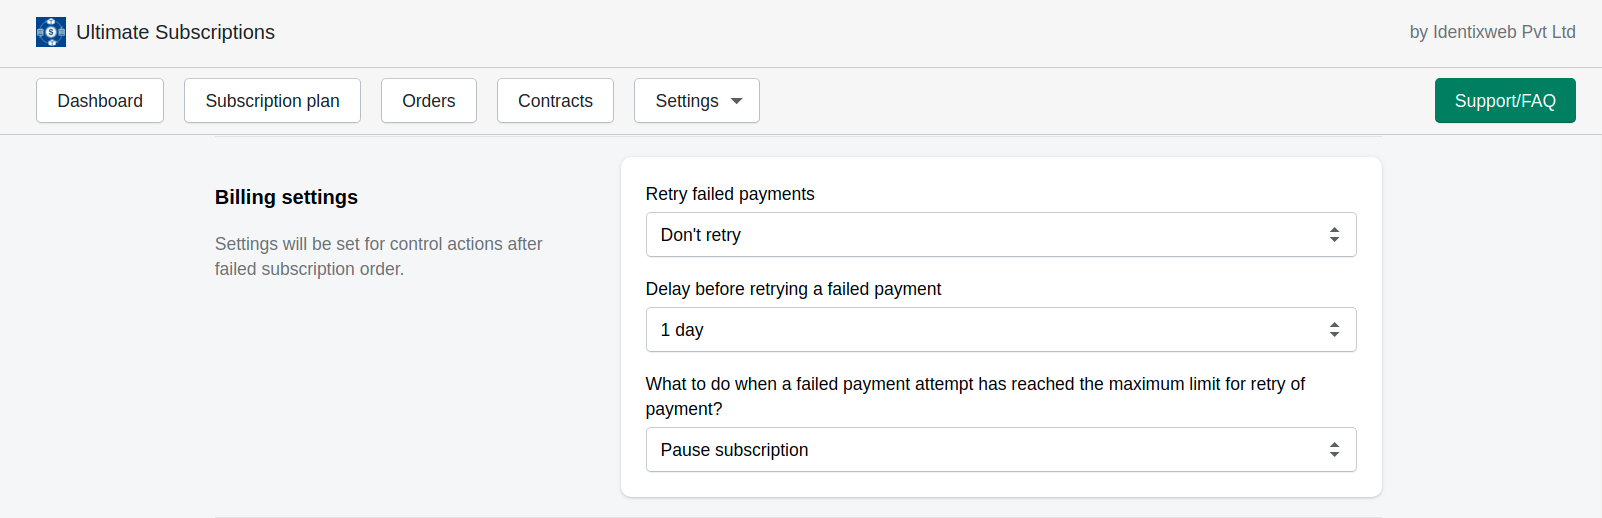 billing-settings